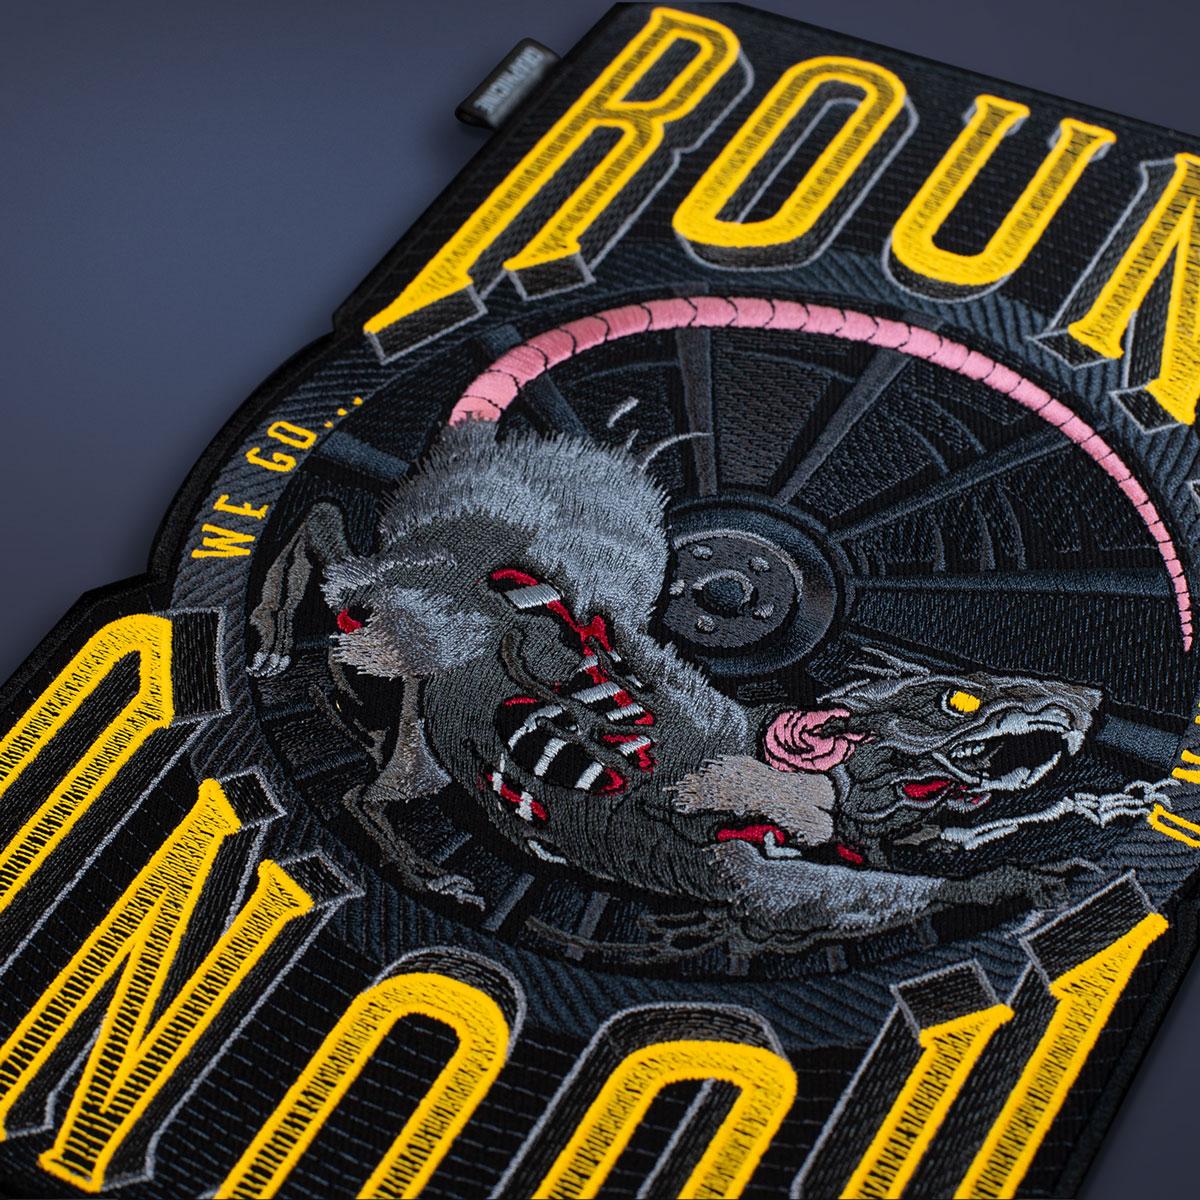 round_and_round_graphicine_2